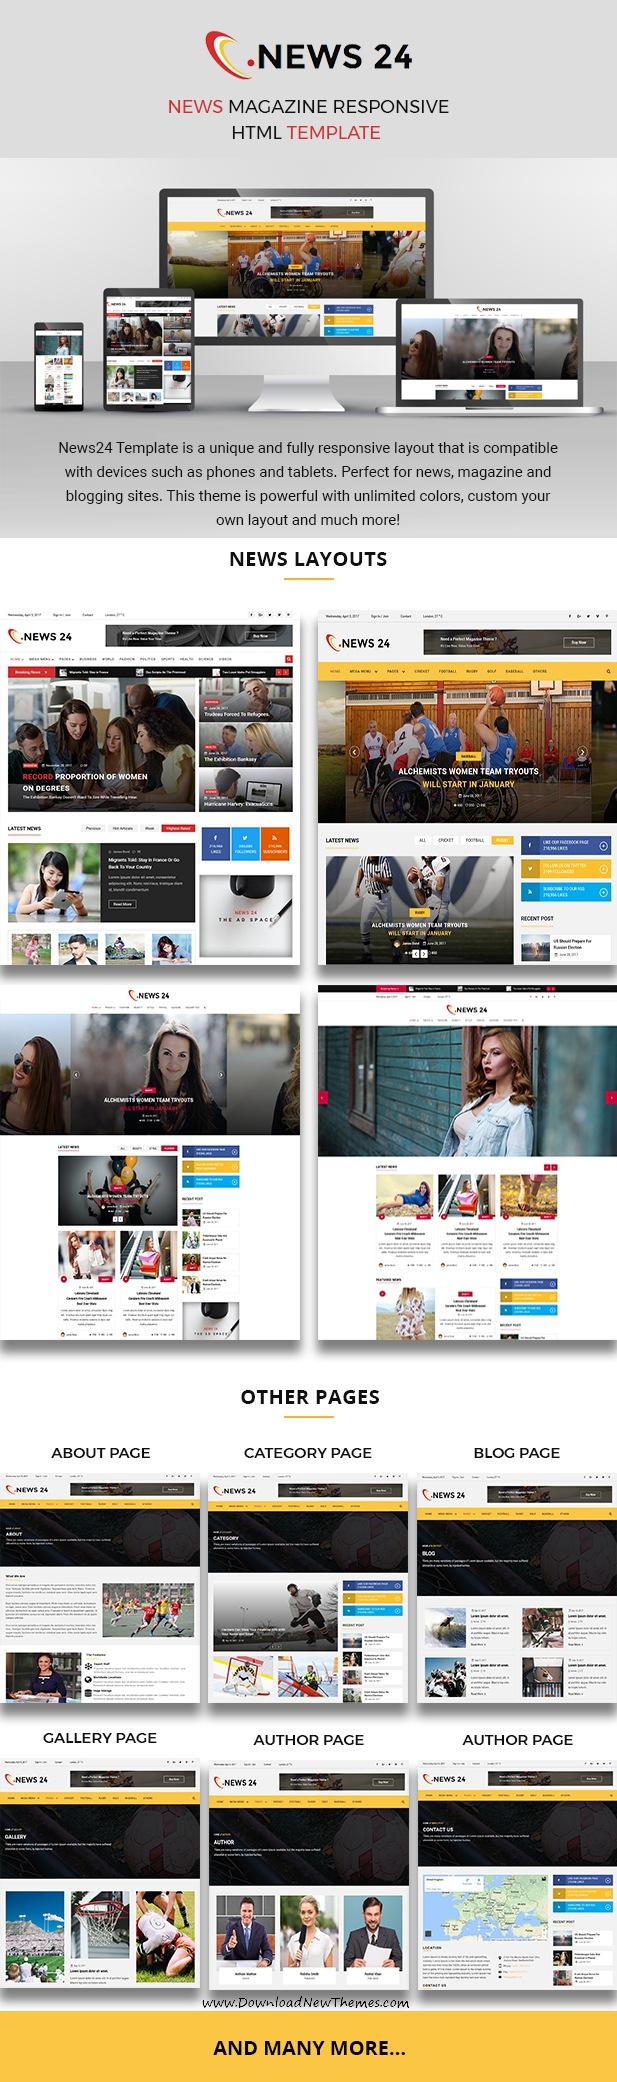 News 24 - News Magazine Responsive HTML Template | Template ...